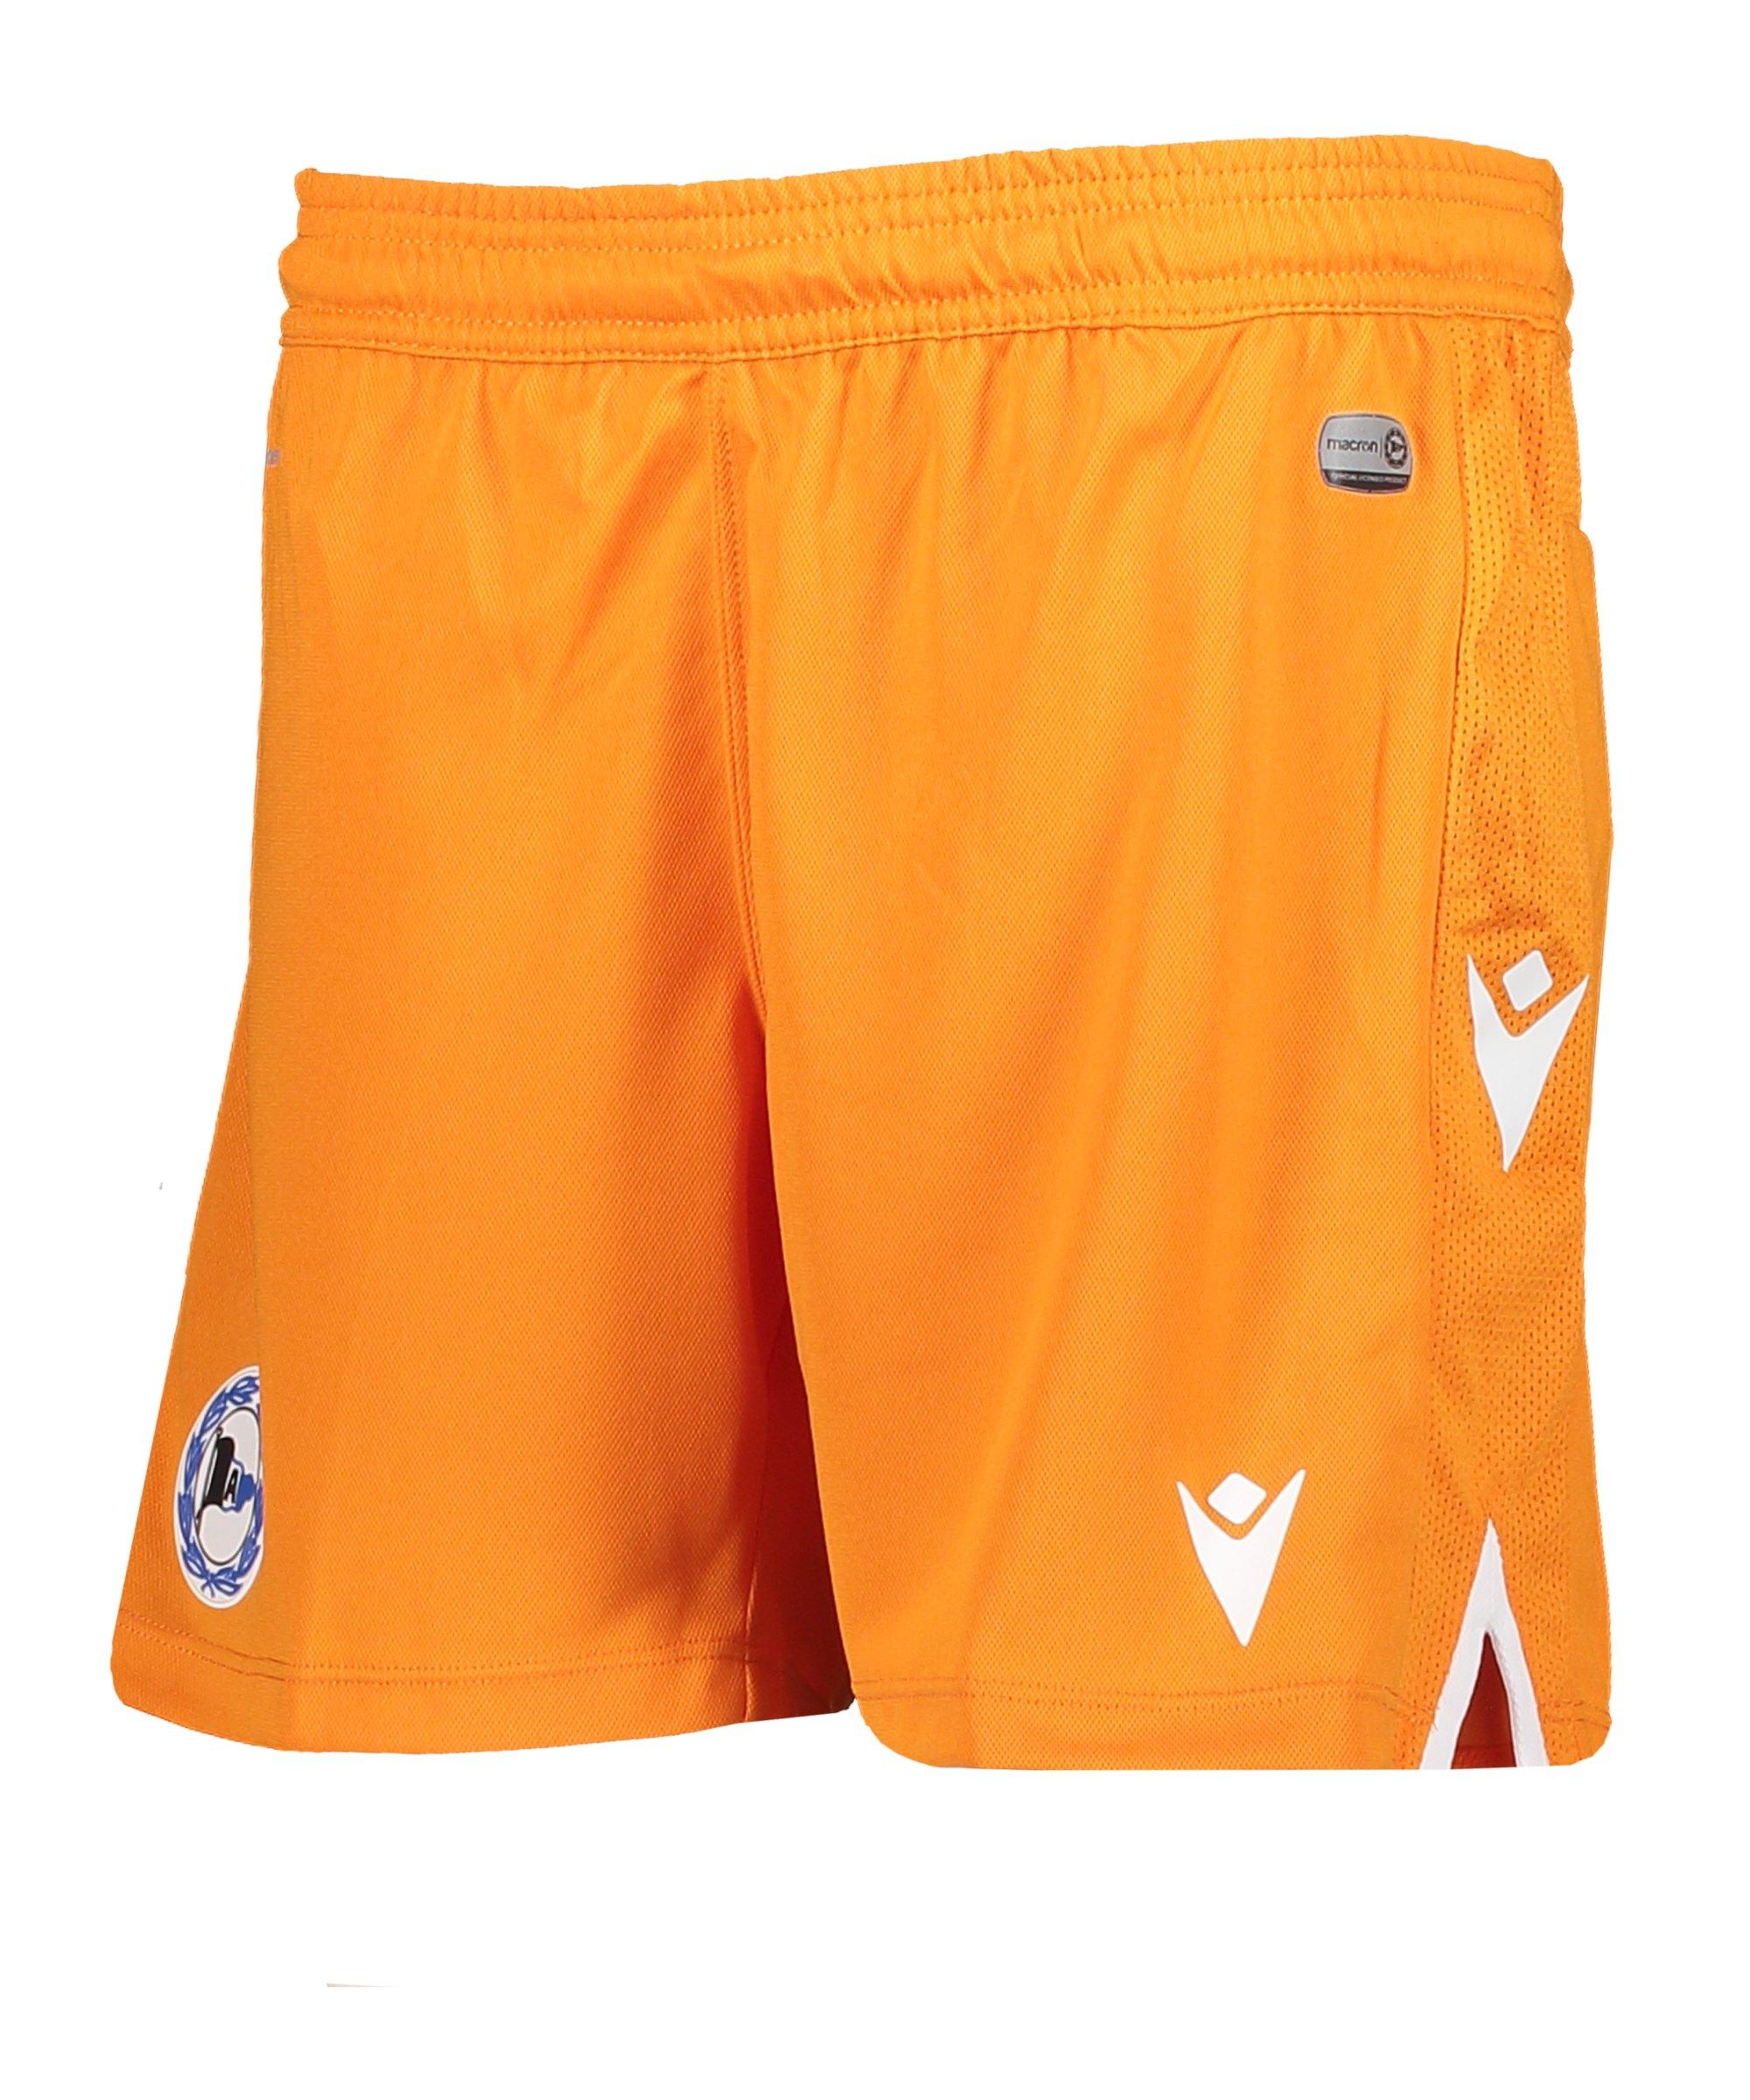 Macron Arminia Bielefeld Short 3rd 2020/2021 Kids Orange - orange